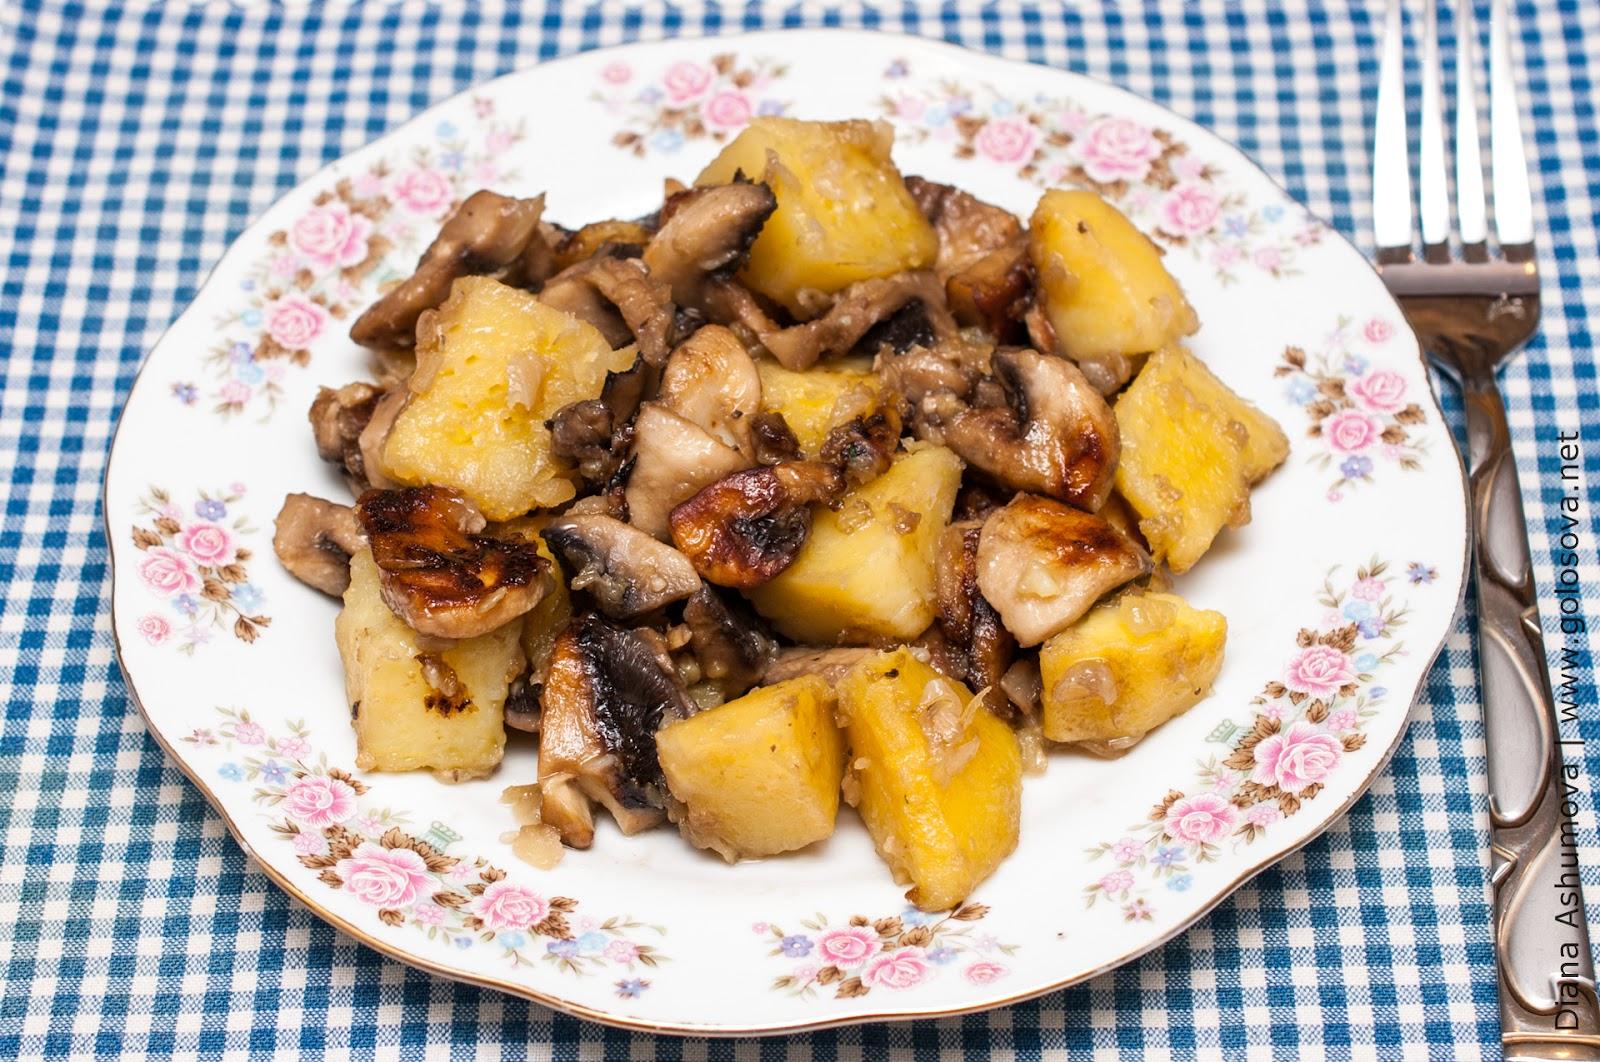 картошка с грибами рецепт на сковороде с фото